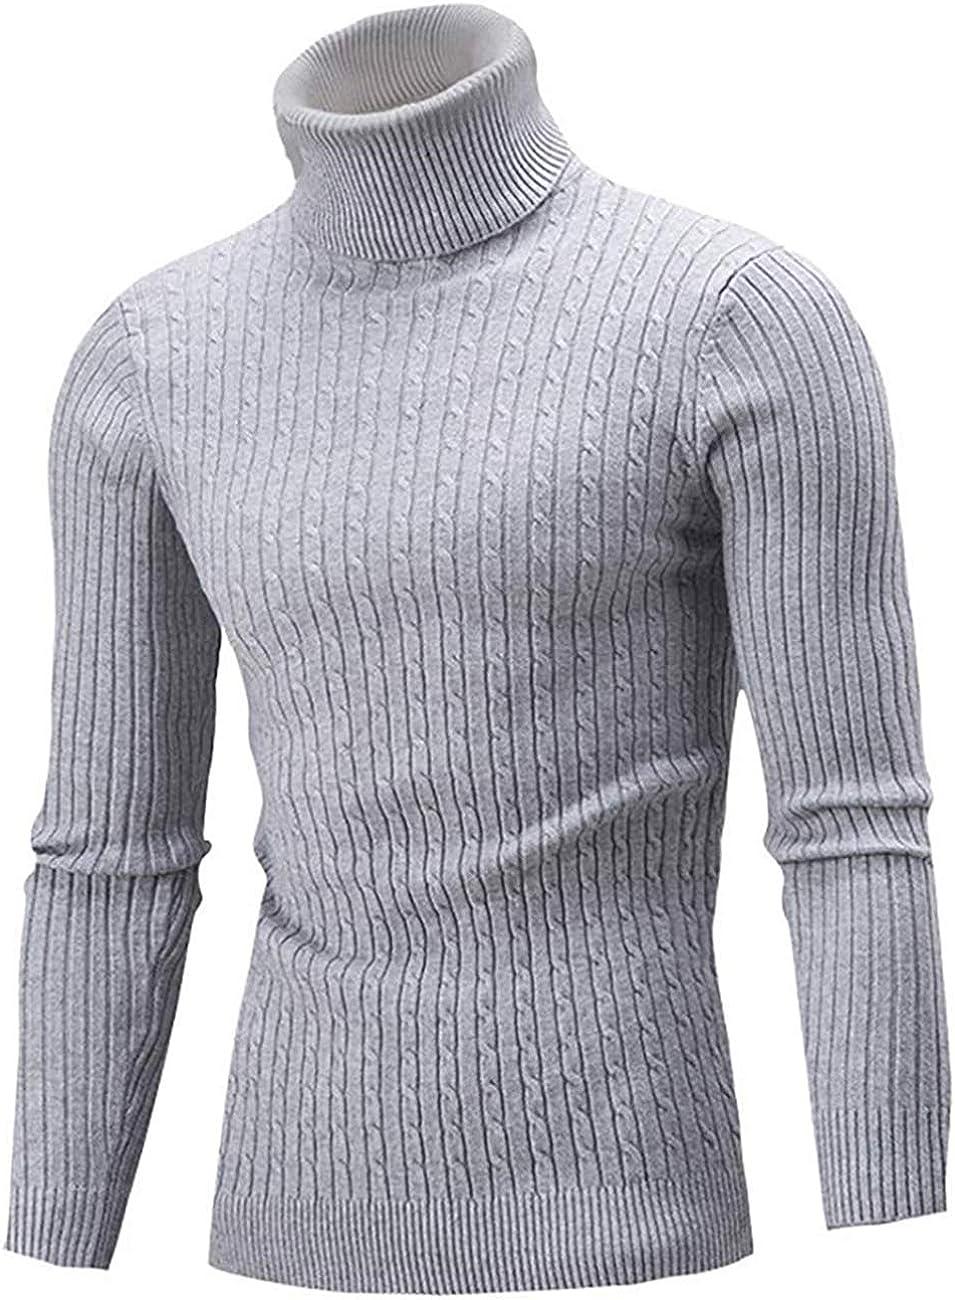 Belovecol Mens Jumpers High Roll Neck Knit Sweater Slim Fit Warm Turtleneck Pullover